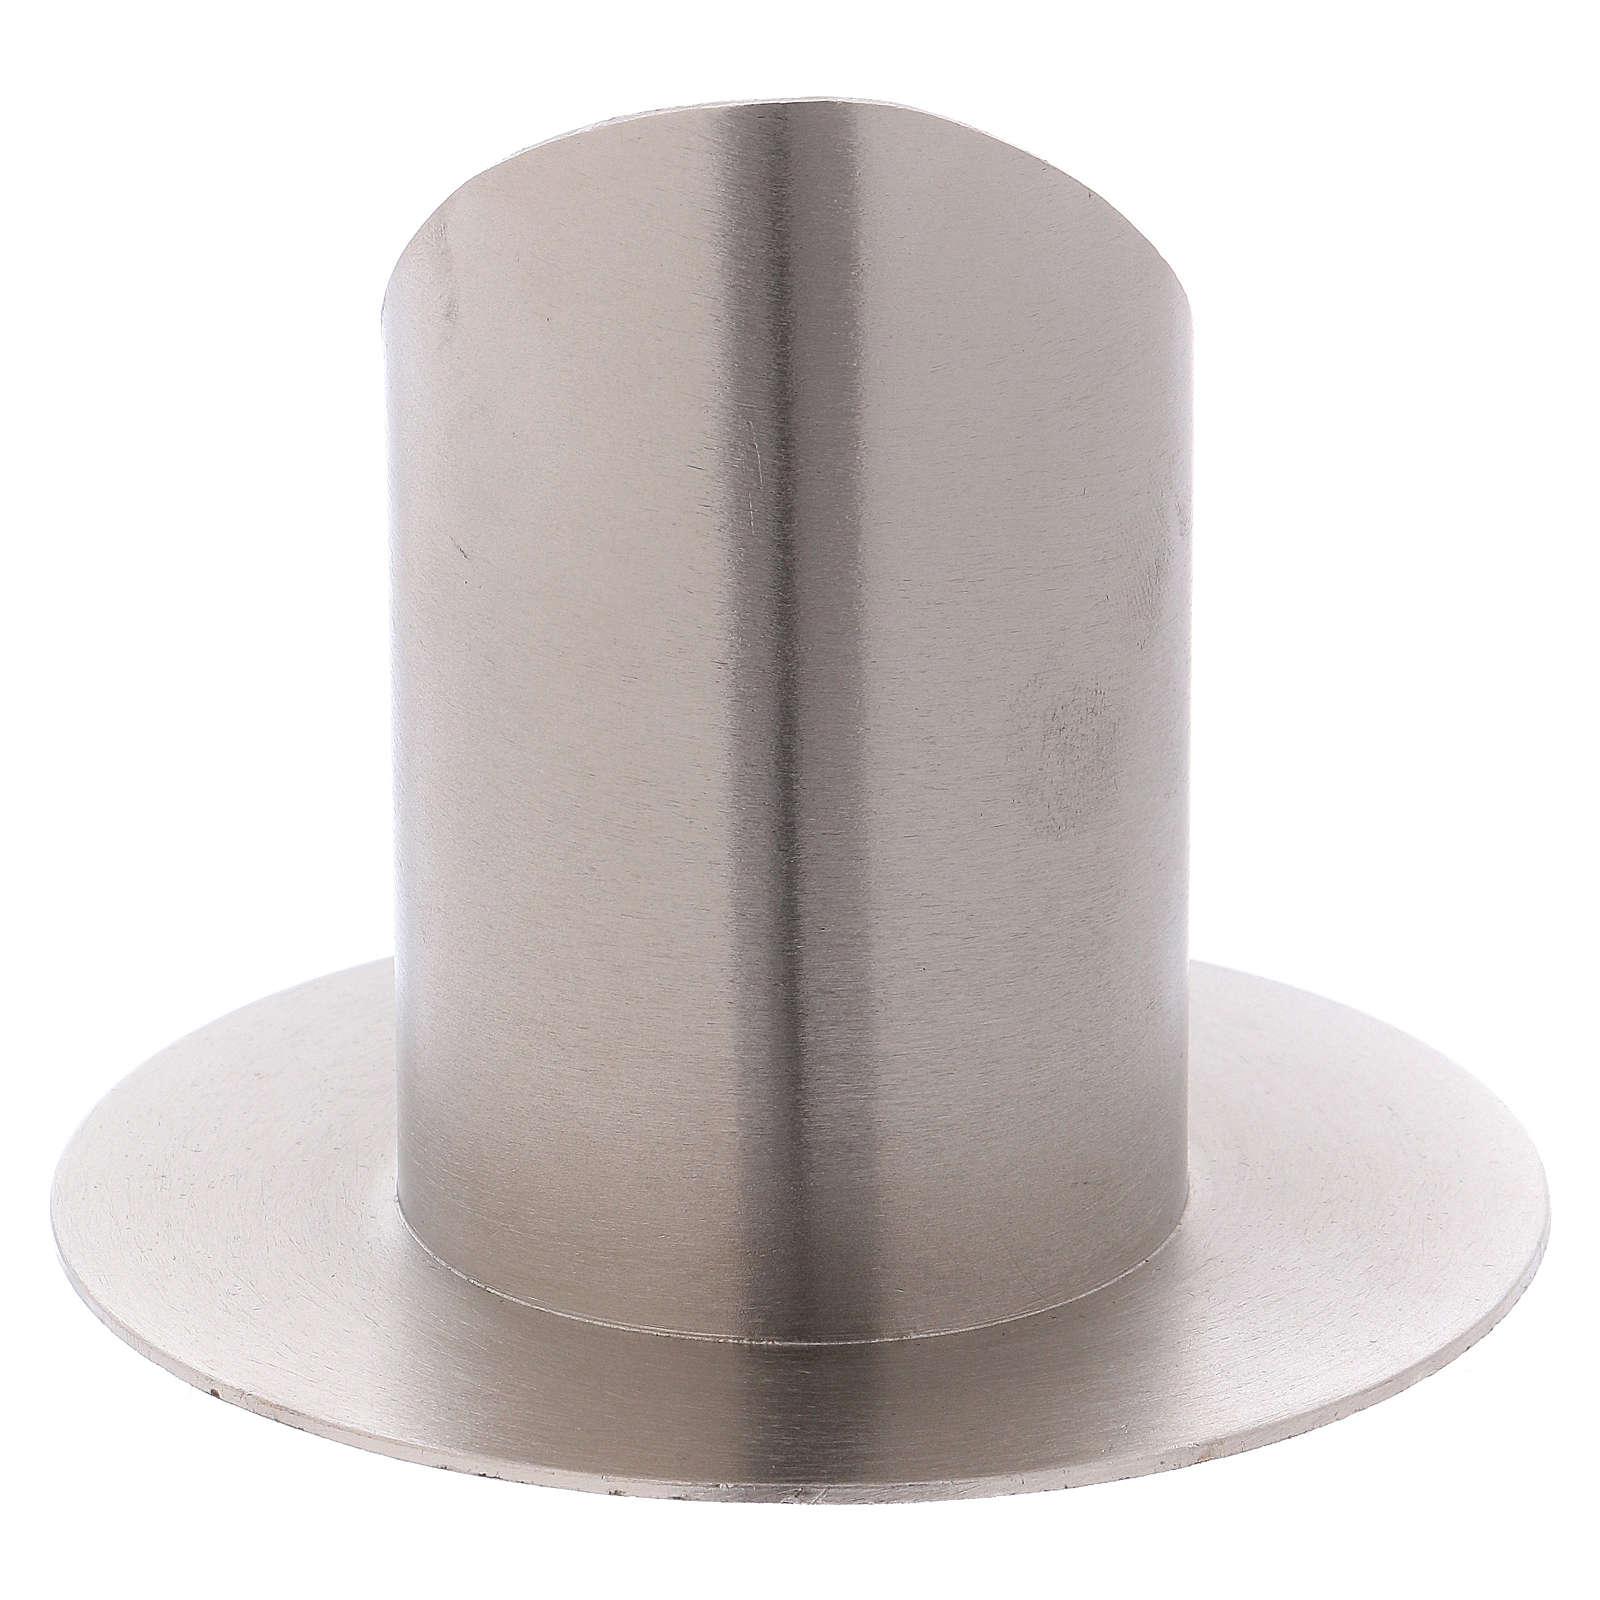 Portacandele ottone nichelato opaco tubo 6 cm 4